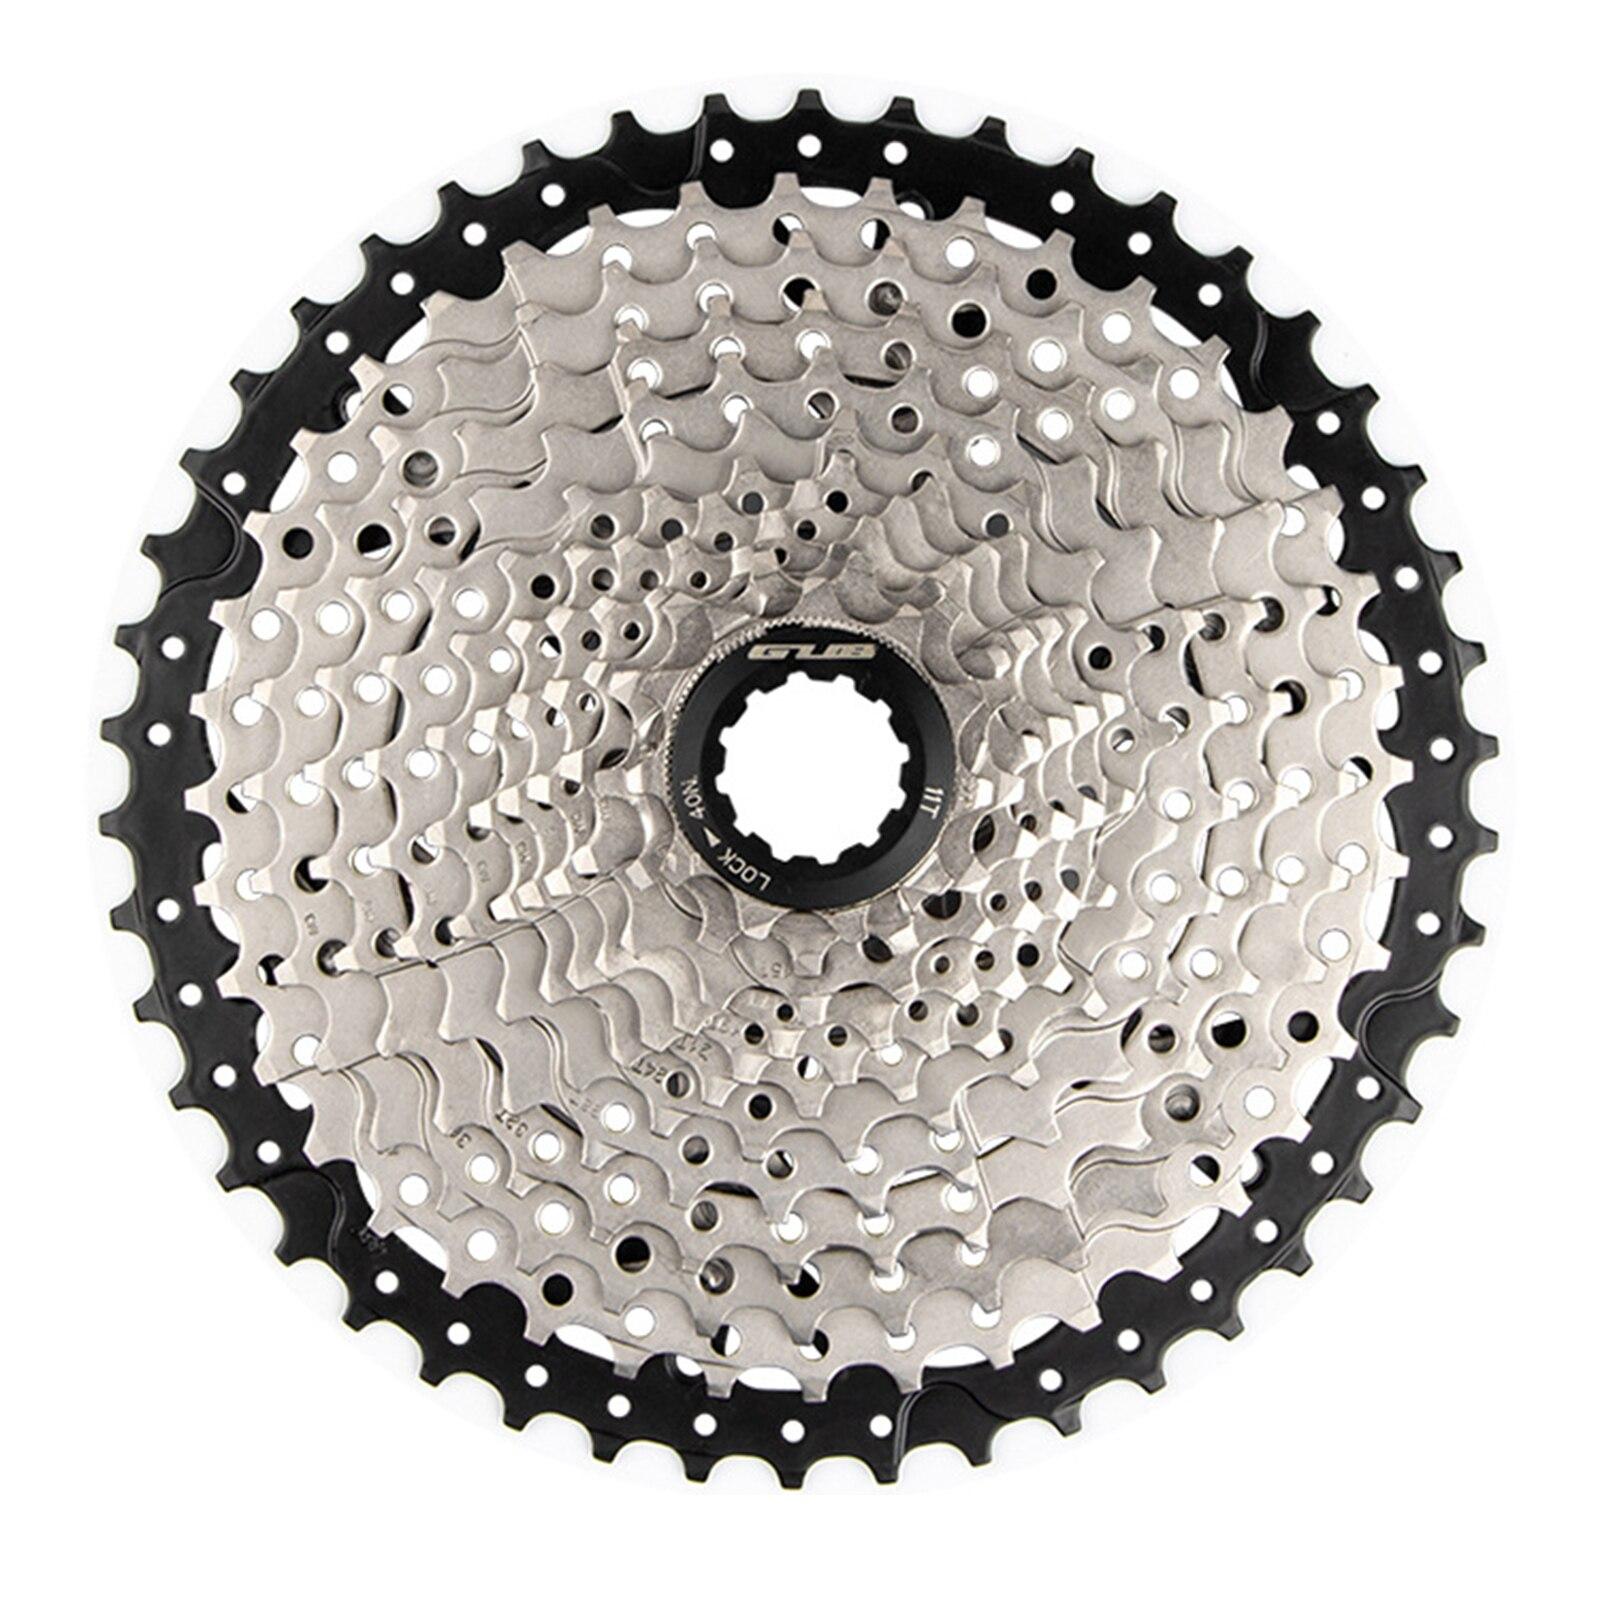 12 Cassette 11 46T Mountain Derailleur MTB Road Shifter Bicycle Chain